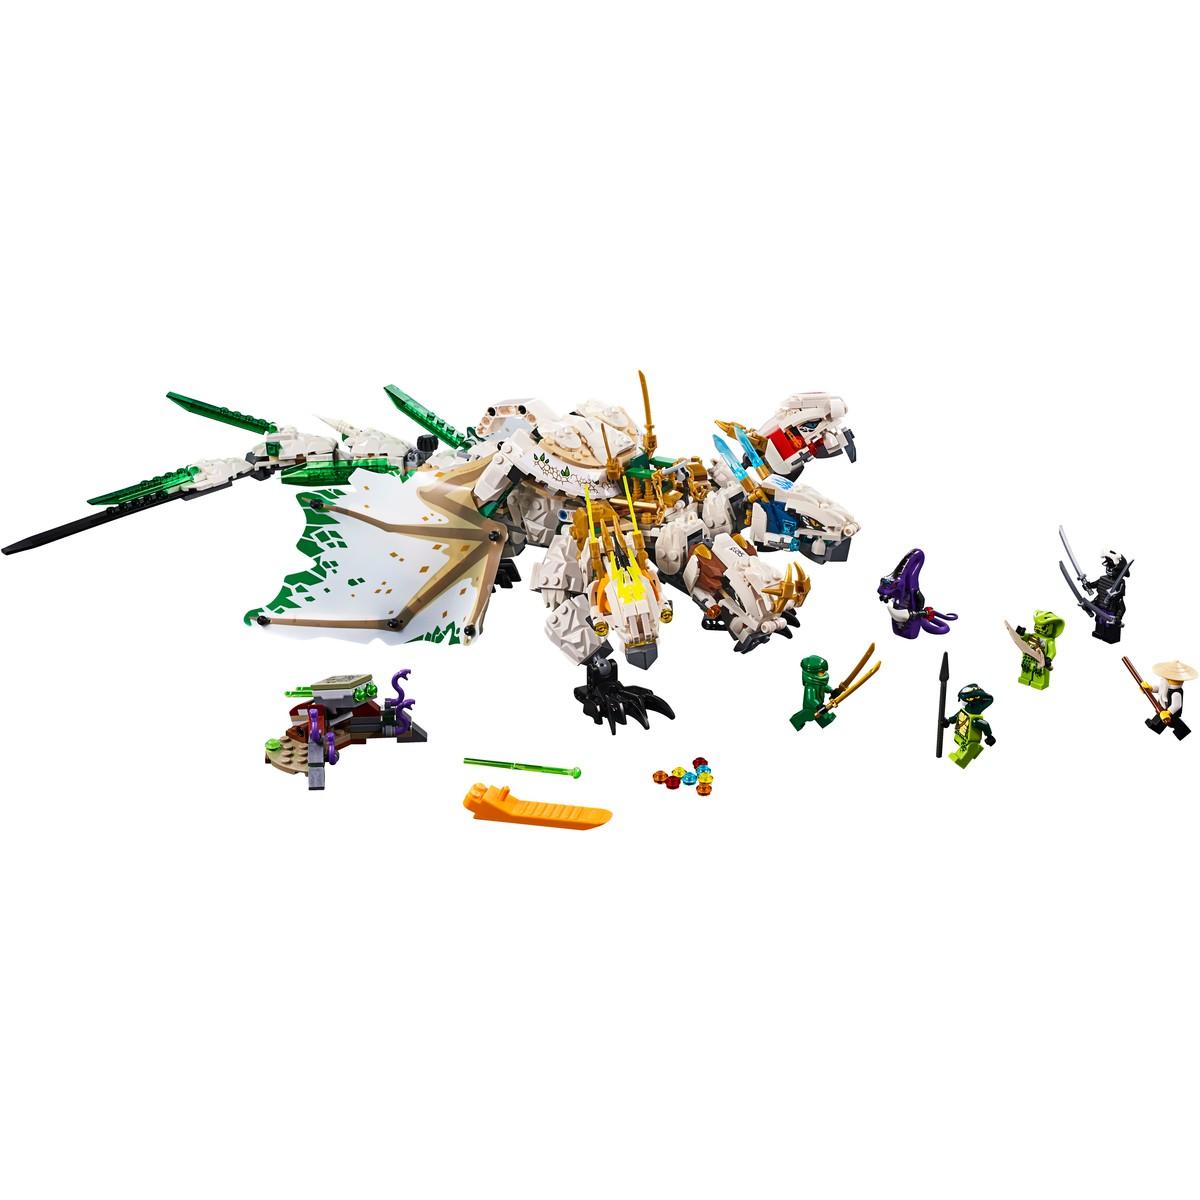 1200x1200 Lego Ninjago The Ultra Dragon